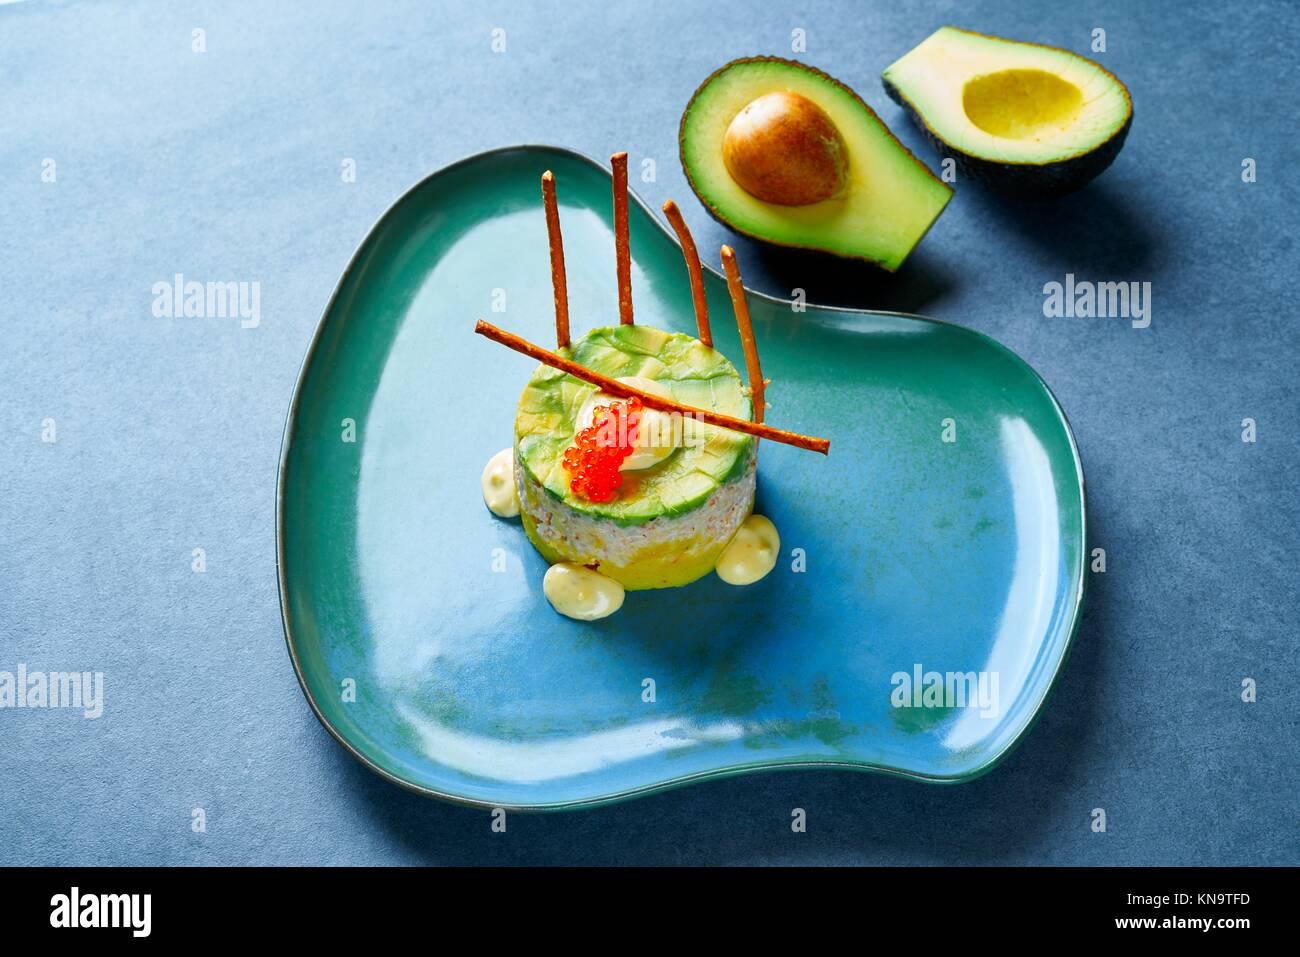 Peruvian Kitchen Stock Photos & Peruvian Kitchen Stock Images - Alamy